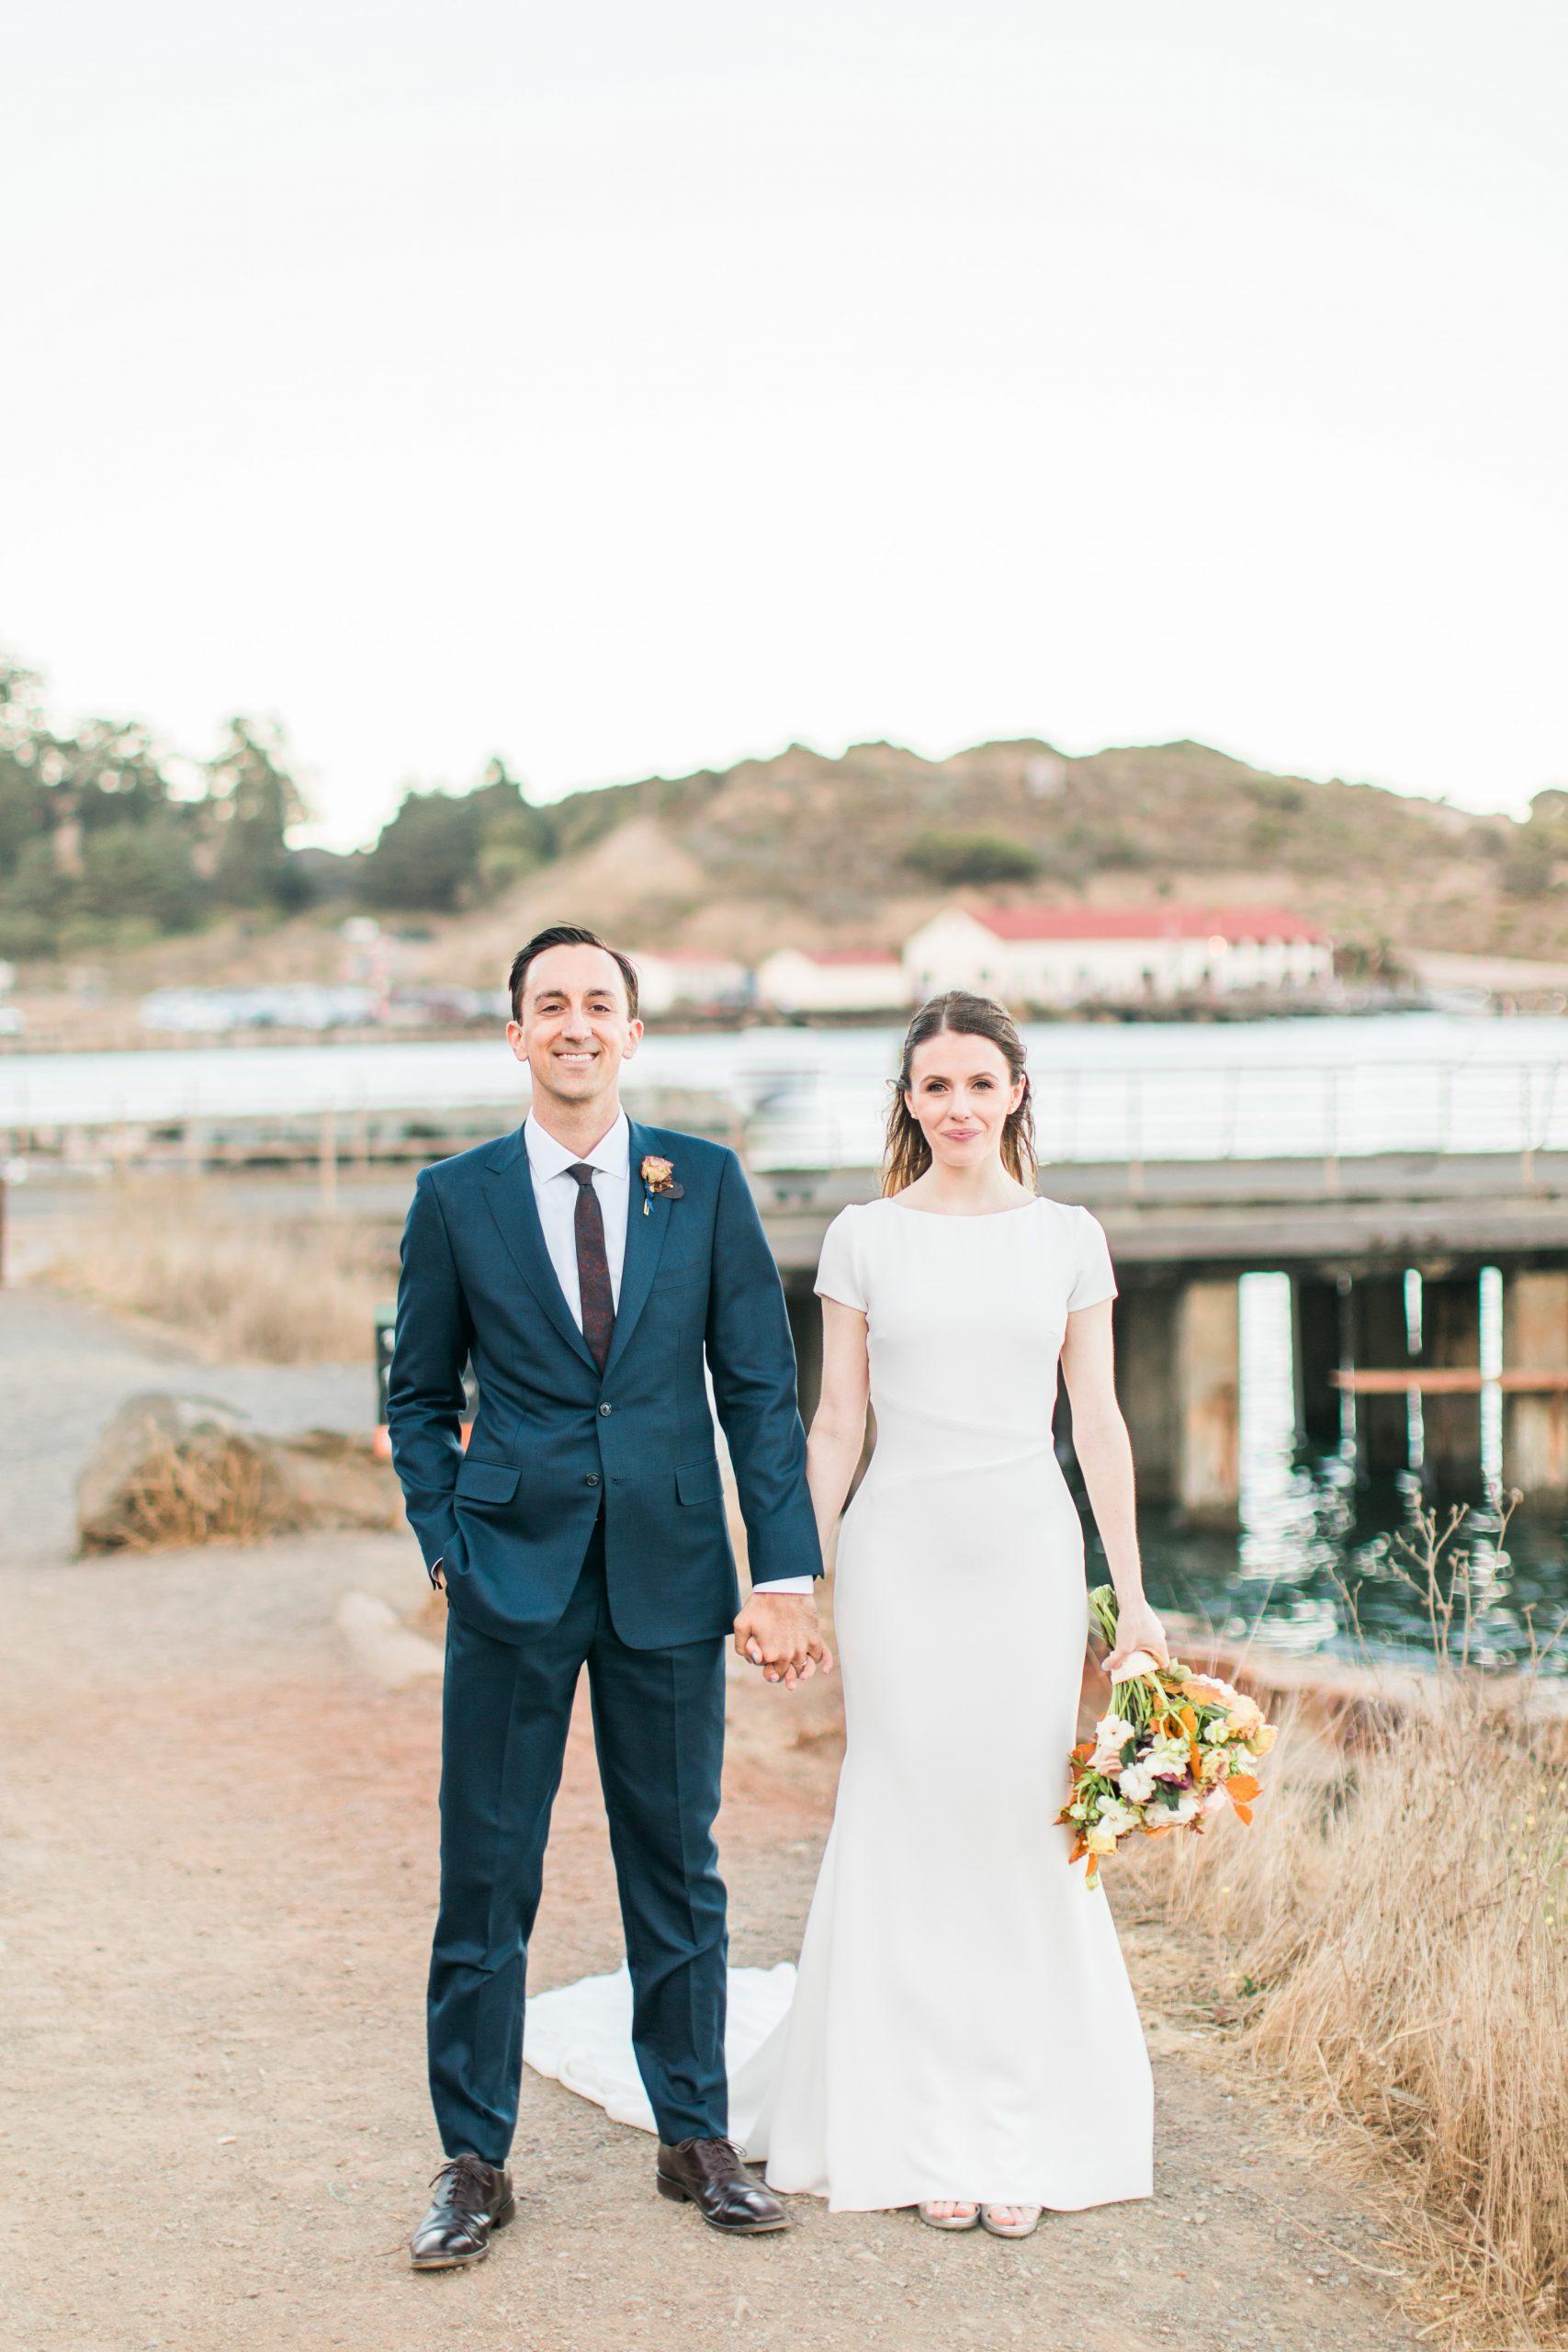 Warm, Autumn Wedding with the Golden Gate Bridge at Cavallo Point